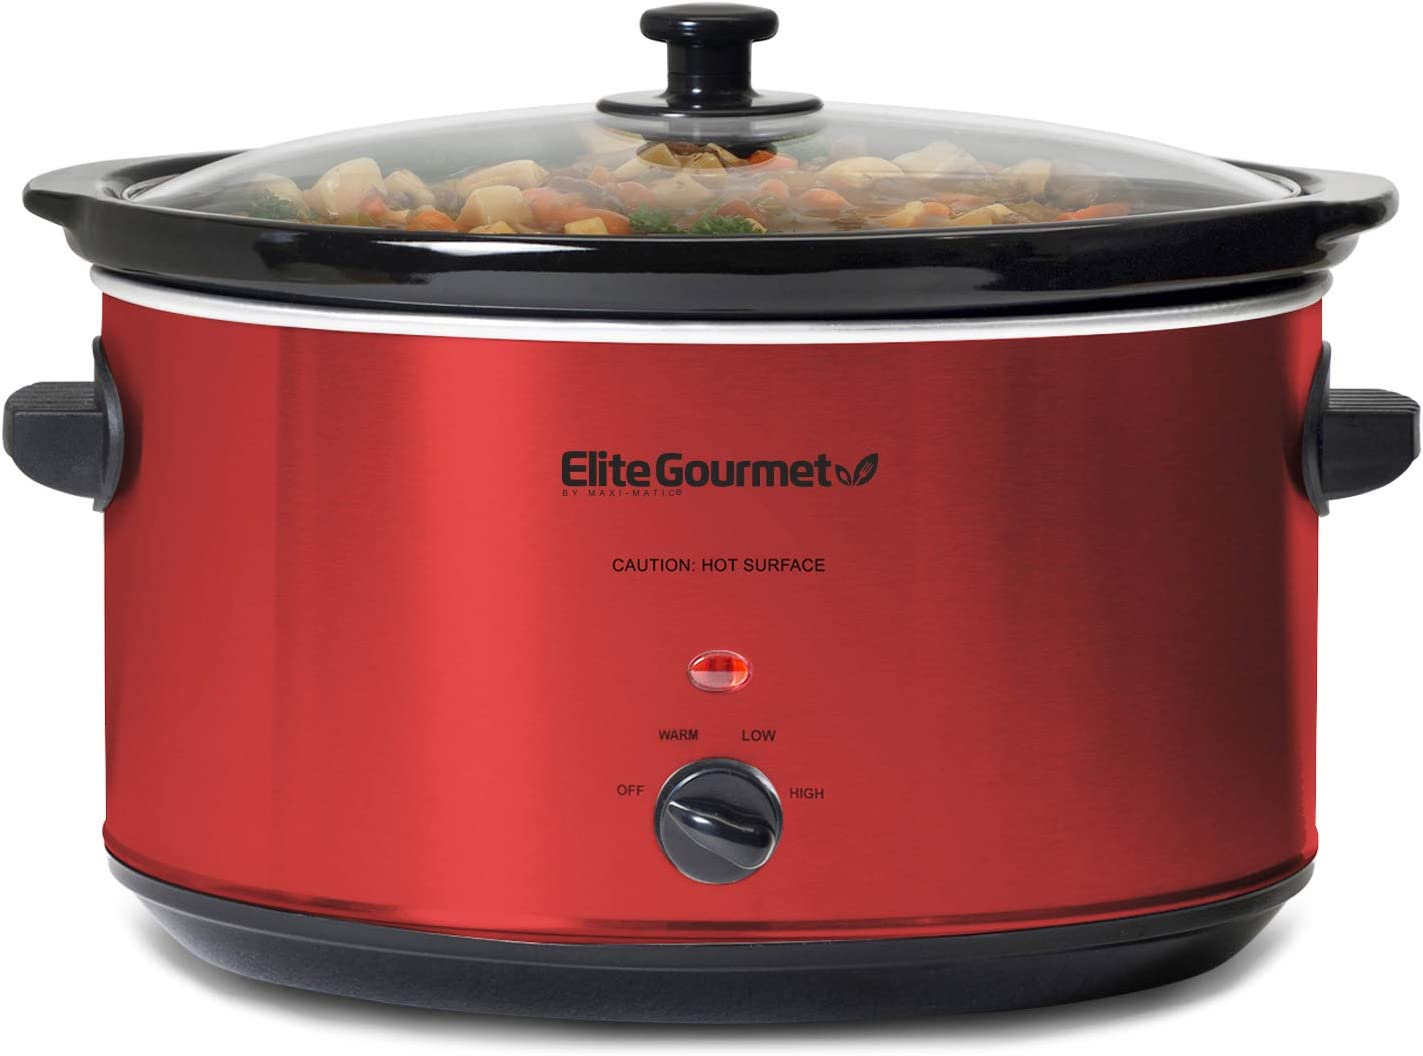 Elite Gourmet MST-900RXT Electric Ceramic XL Jumbo Slow Cooker Adjustable Temp, Entrees, Sauces, Stews & Dips, Dishwasher Safe Glass Lid & Crock, 8.5 Quart, Red